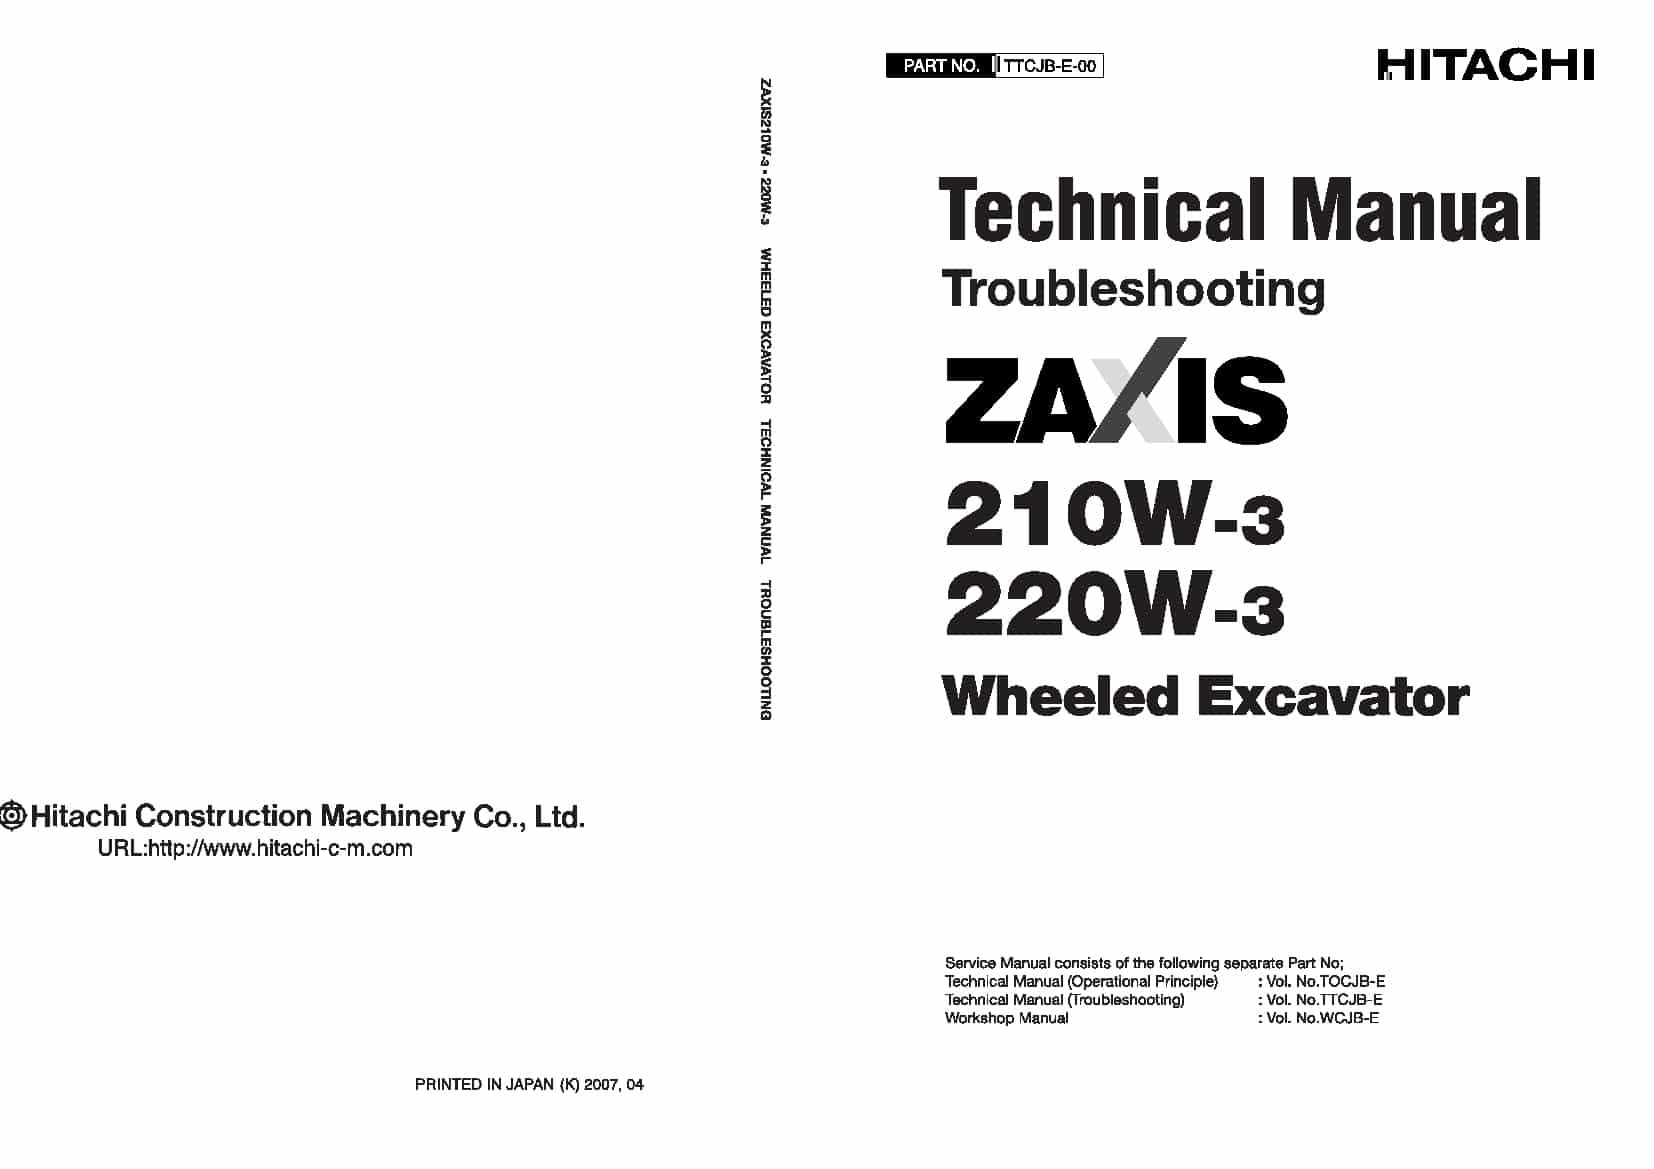 Hitachi Zaxis 210W-3 220W-3 Technical manual